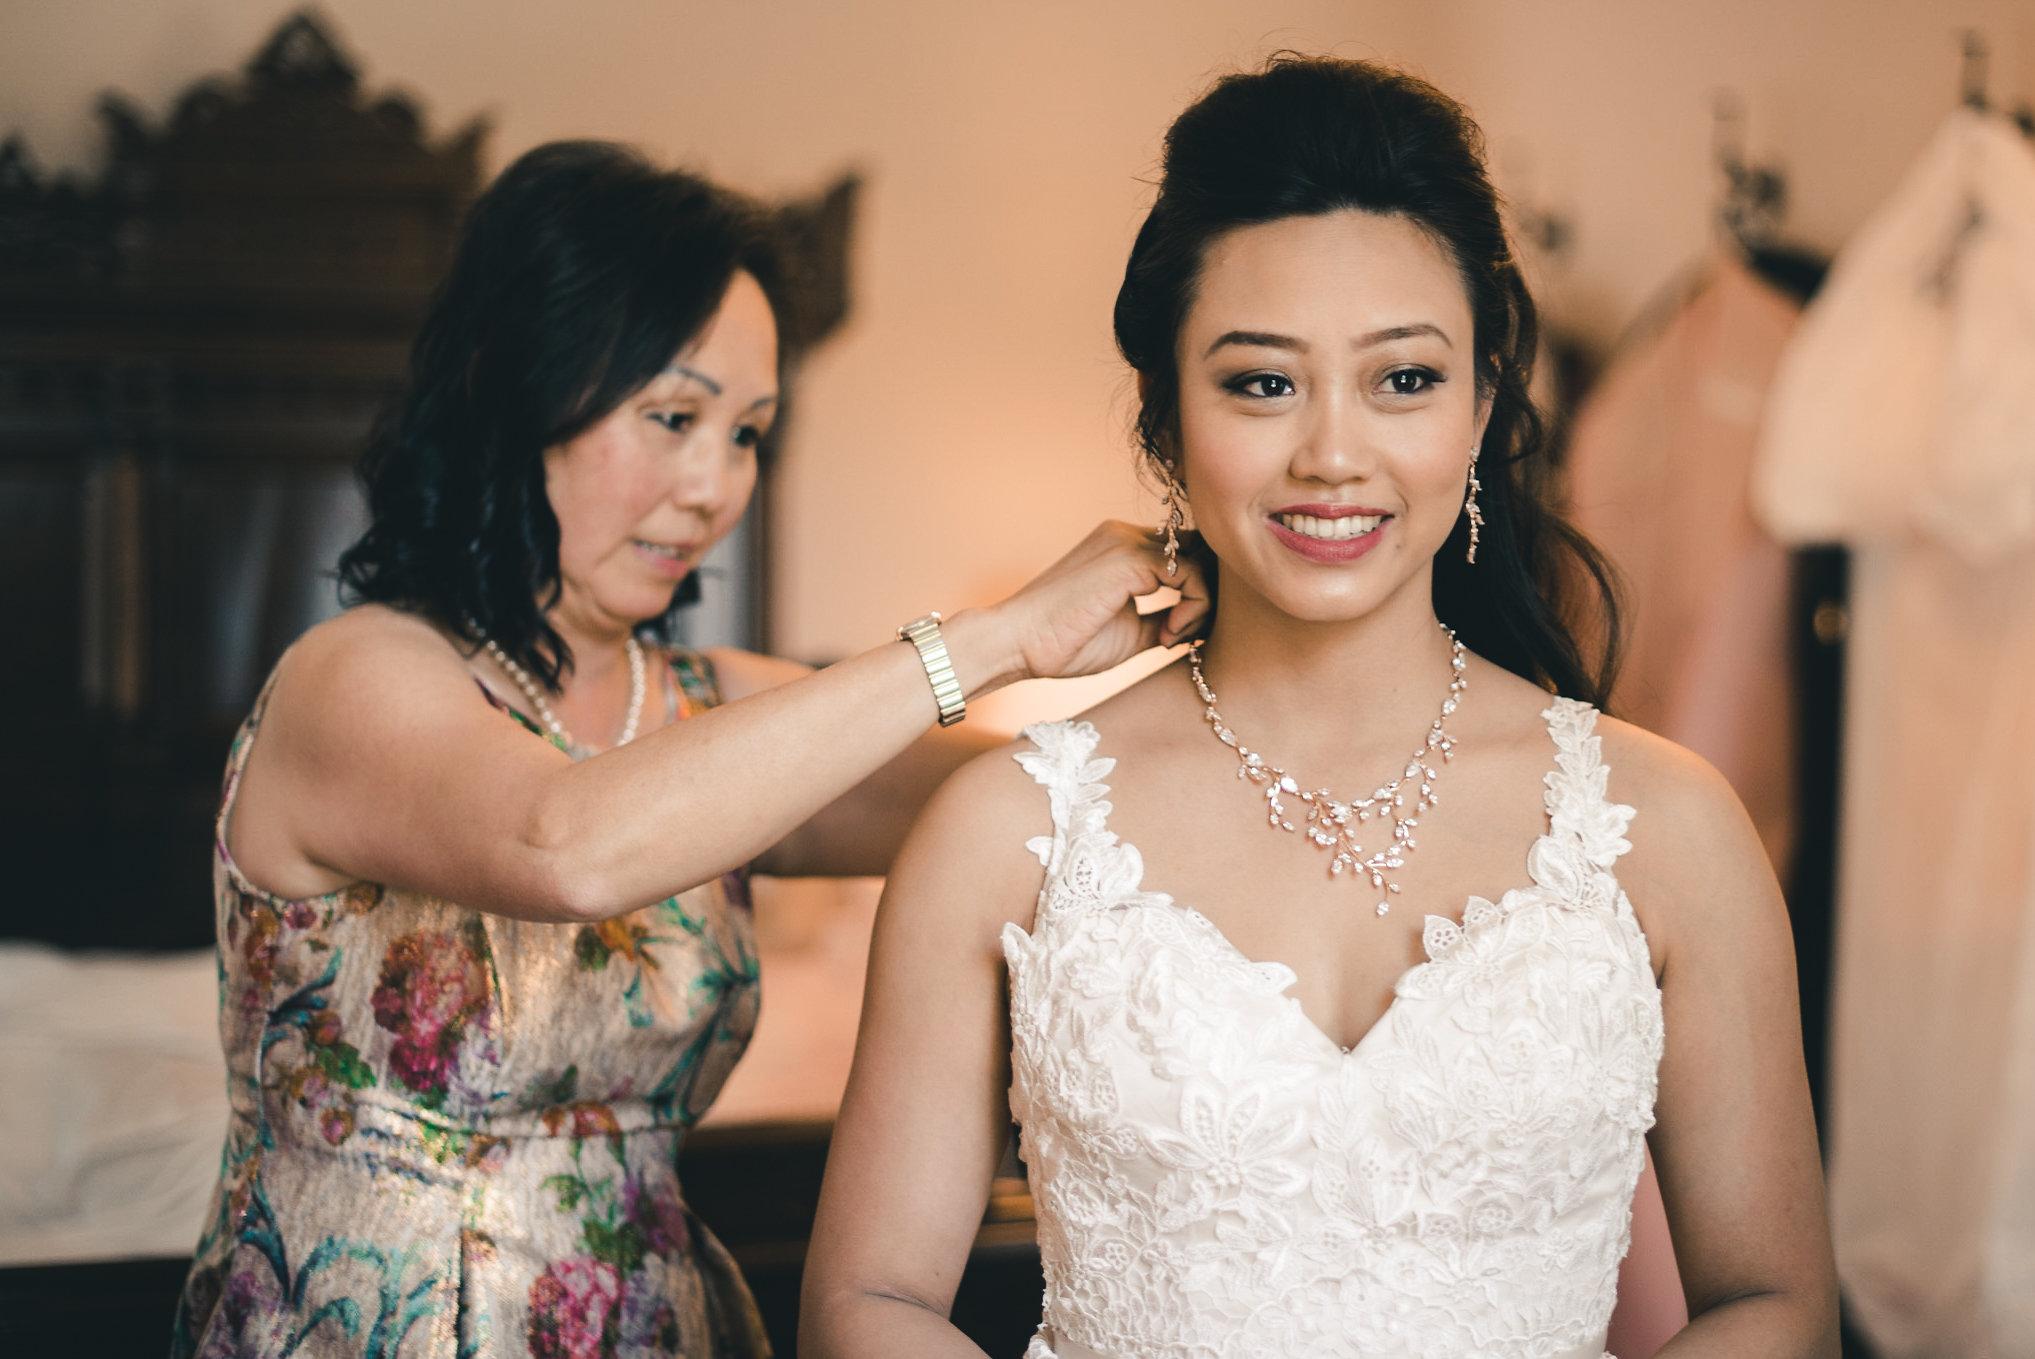 Mother helping bride get dressed